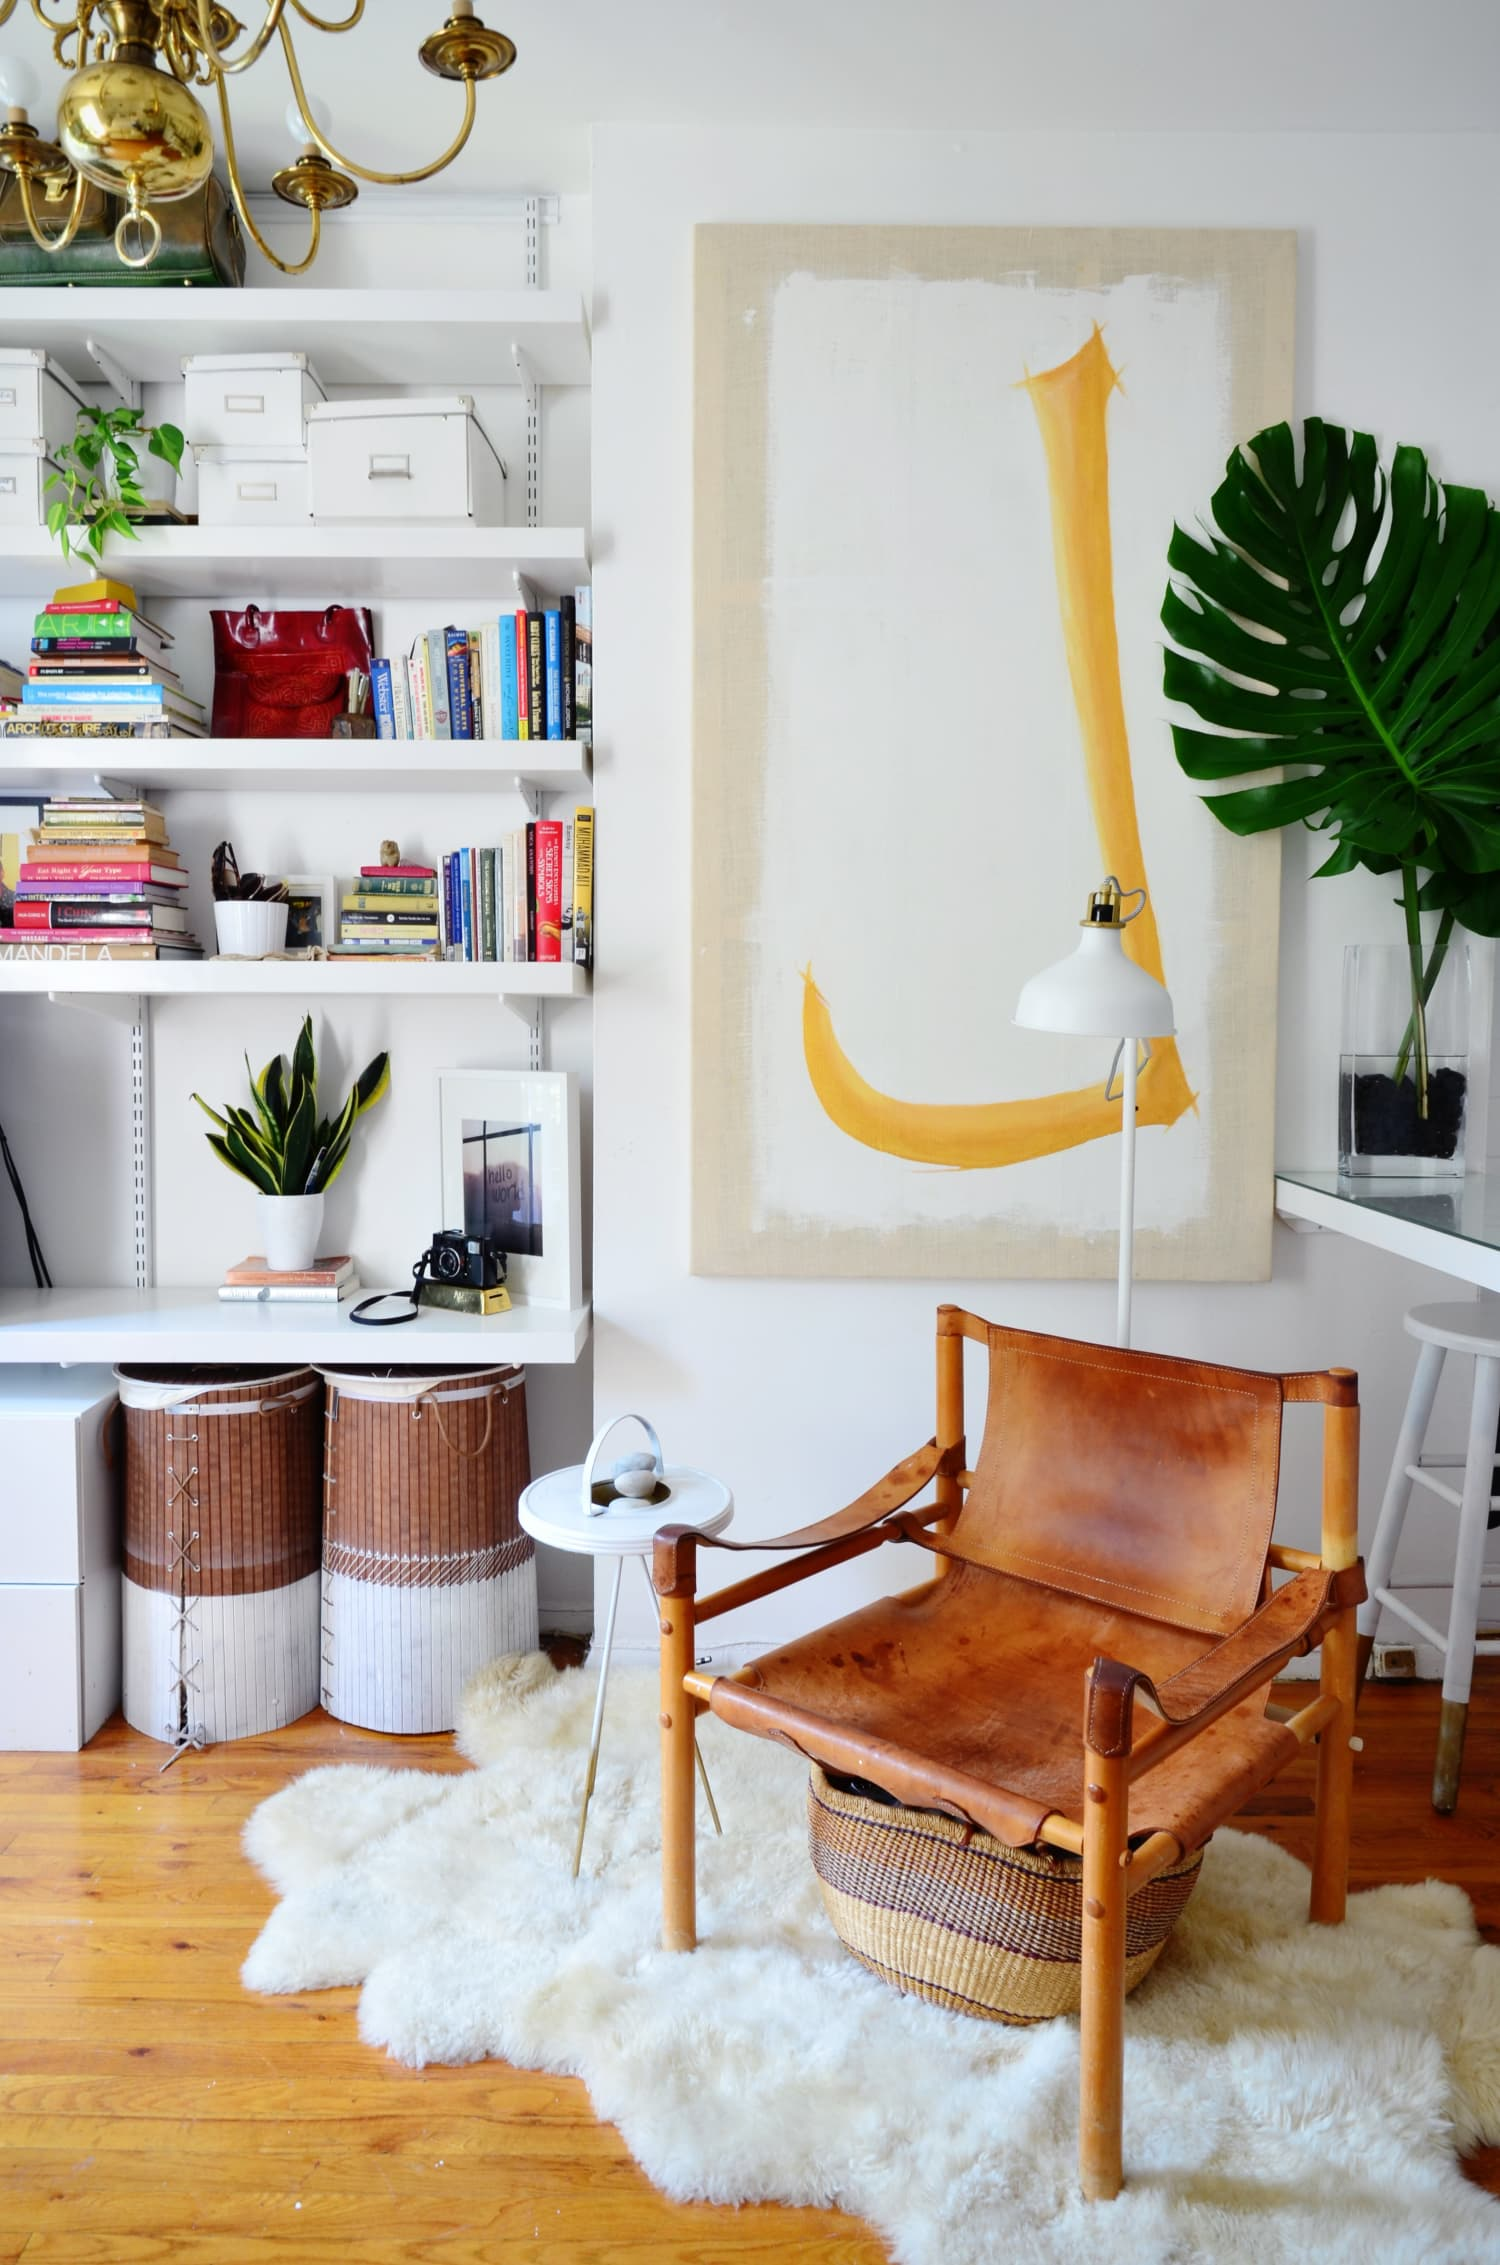 9 smart design ideas for your studio apartment apartment - How to design a studio apartment ...